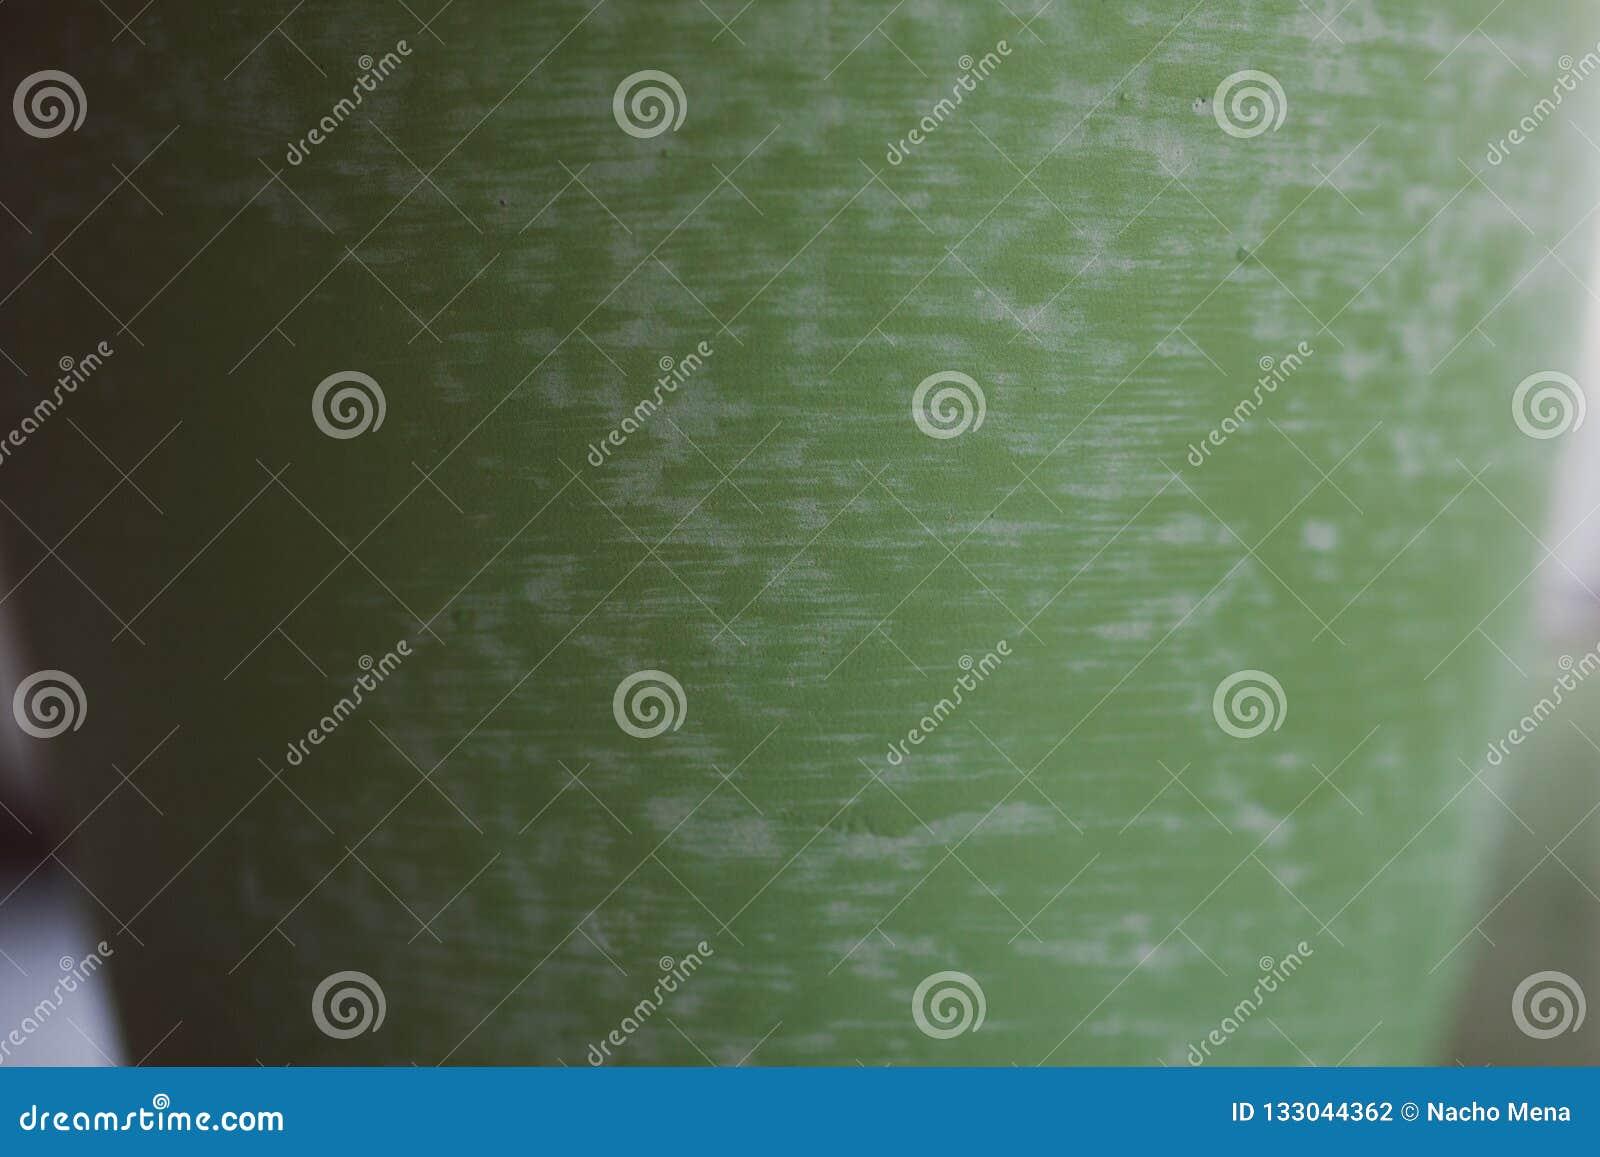 Textura verde de la cerámica hecha a mano Vista ascendente cercana de la superficie de cerámica verde